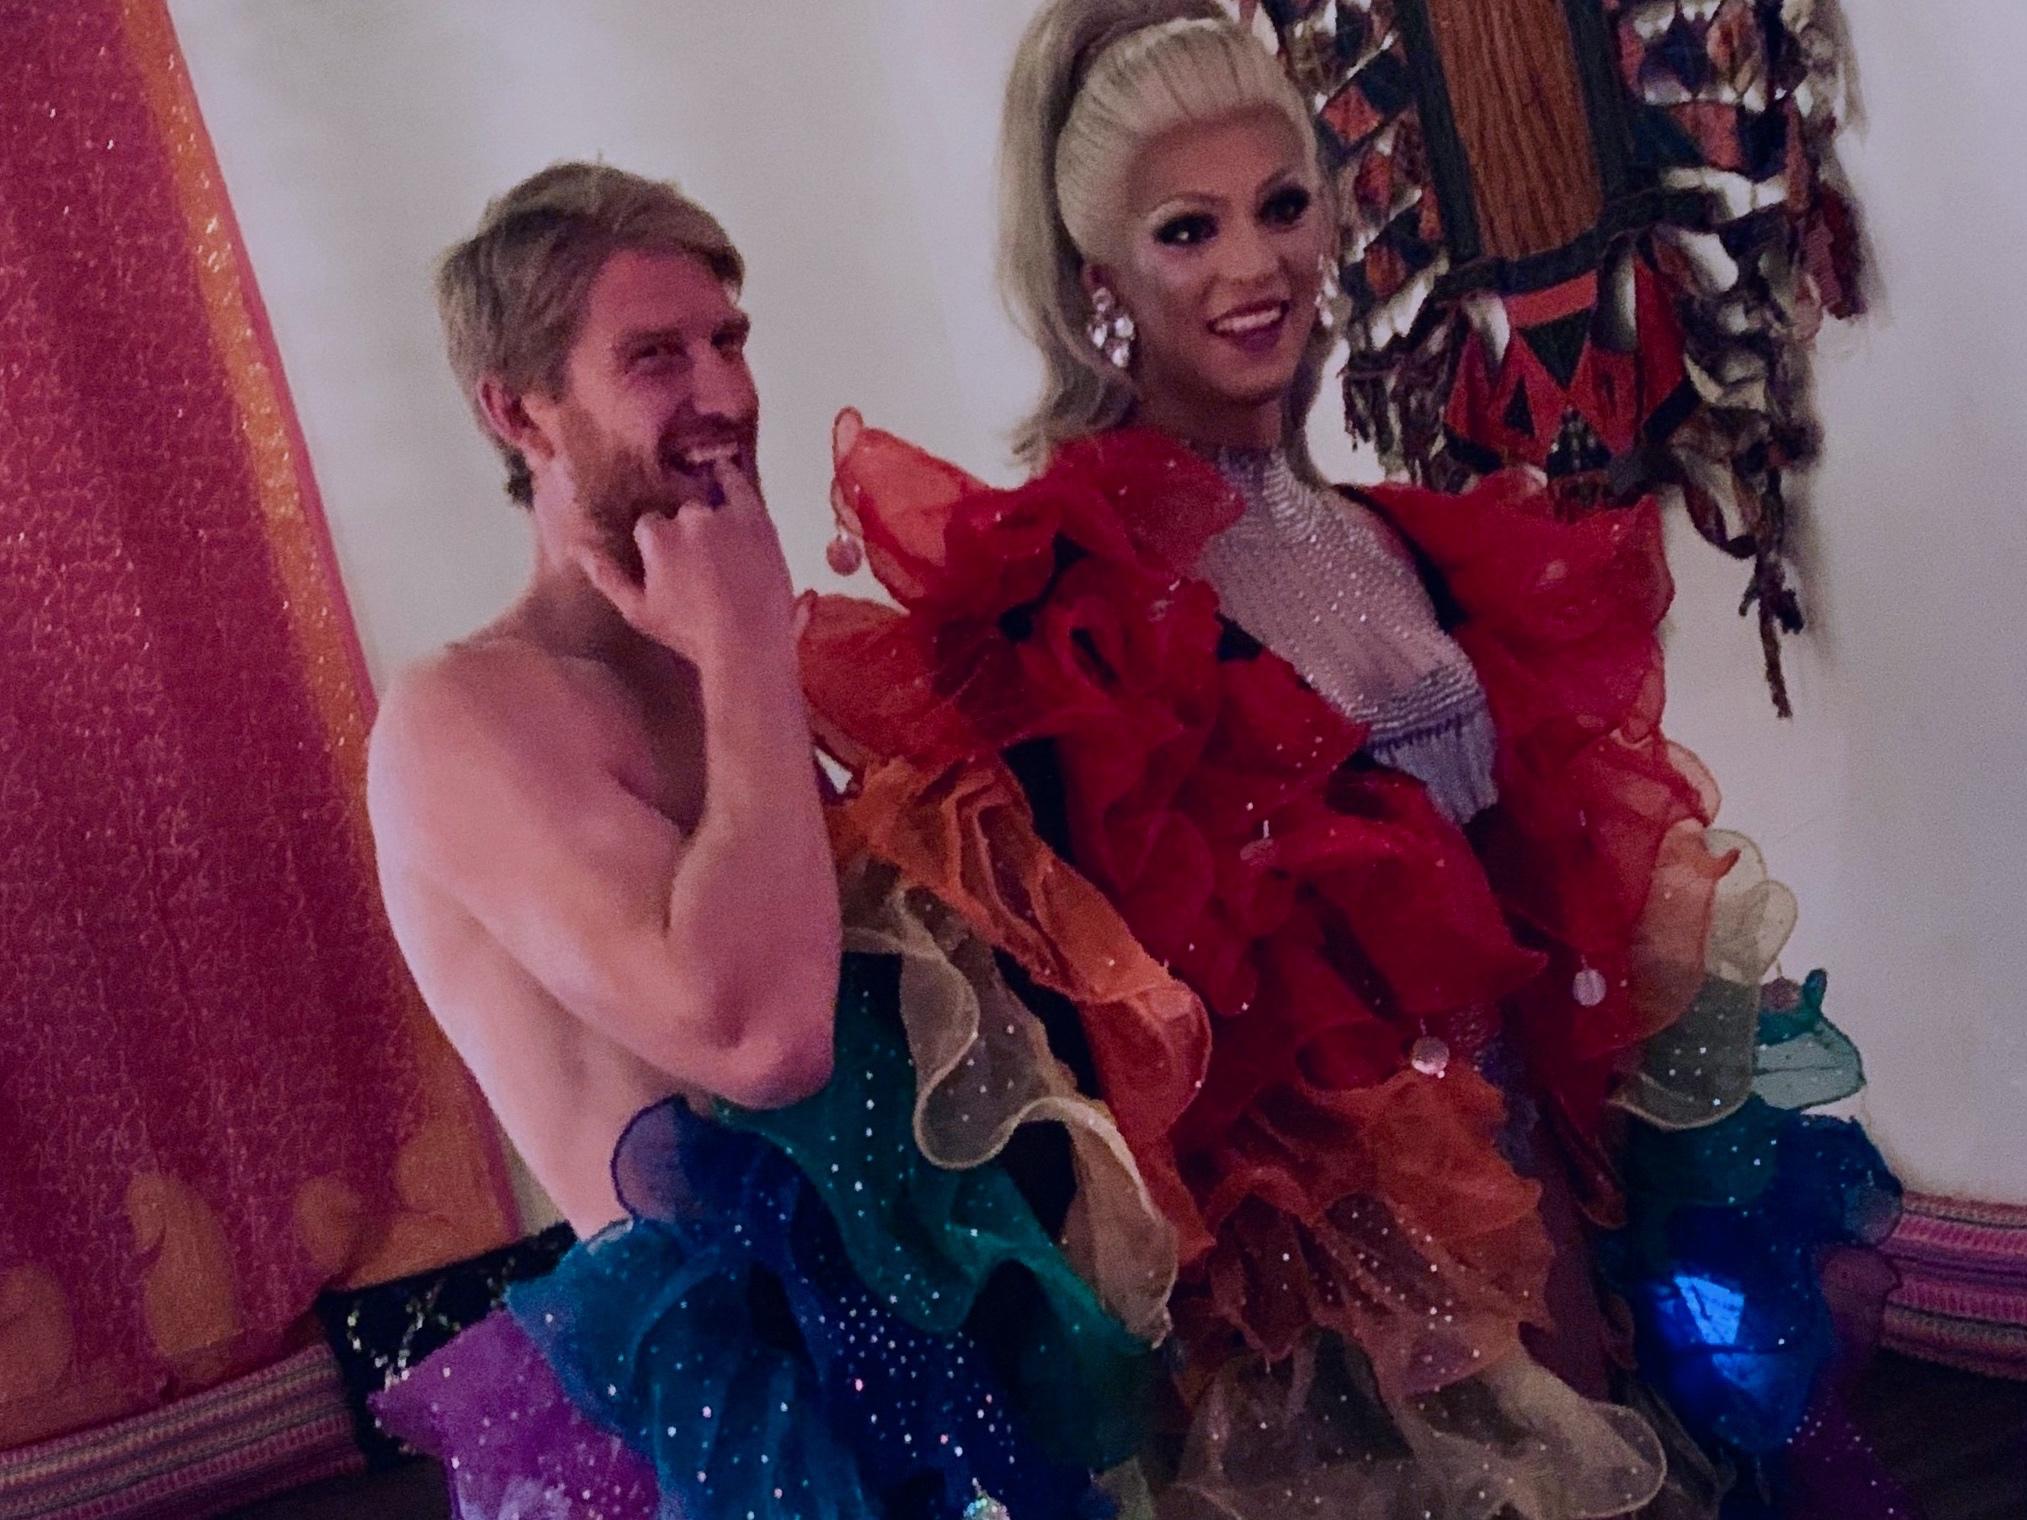 Our model Dan with Sam the Karaoke drag queen